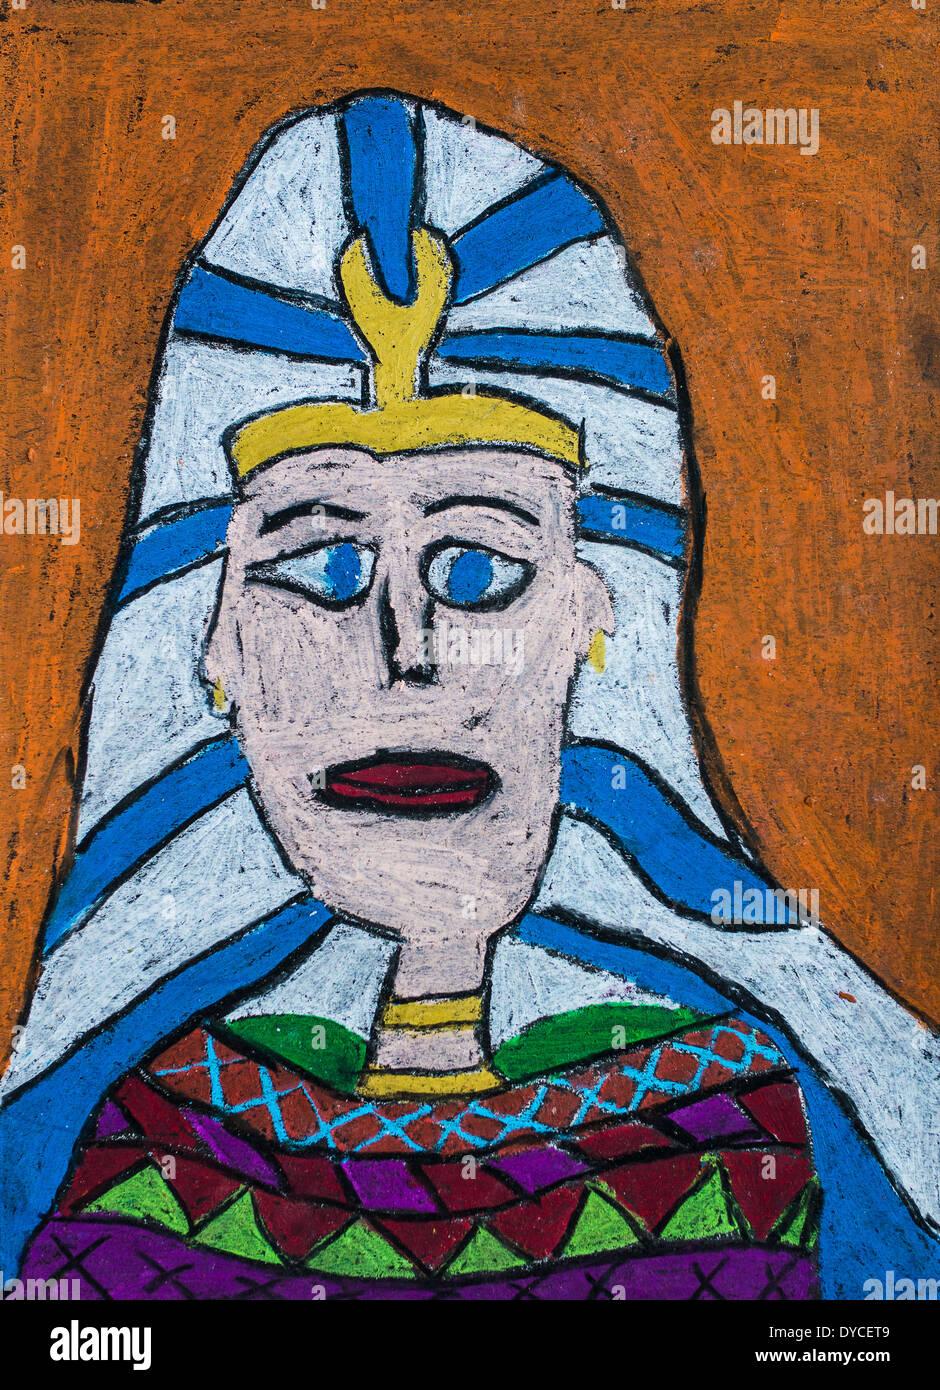 Proyecto de arte infantil: Faraones. Foto de stock